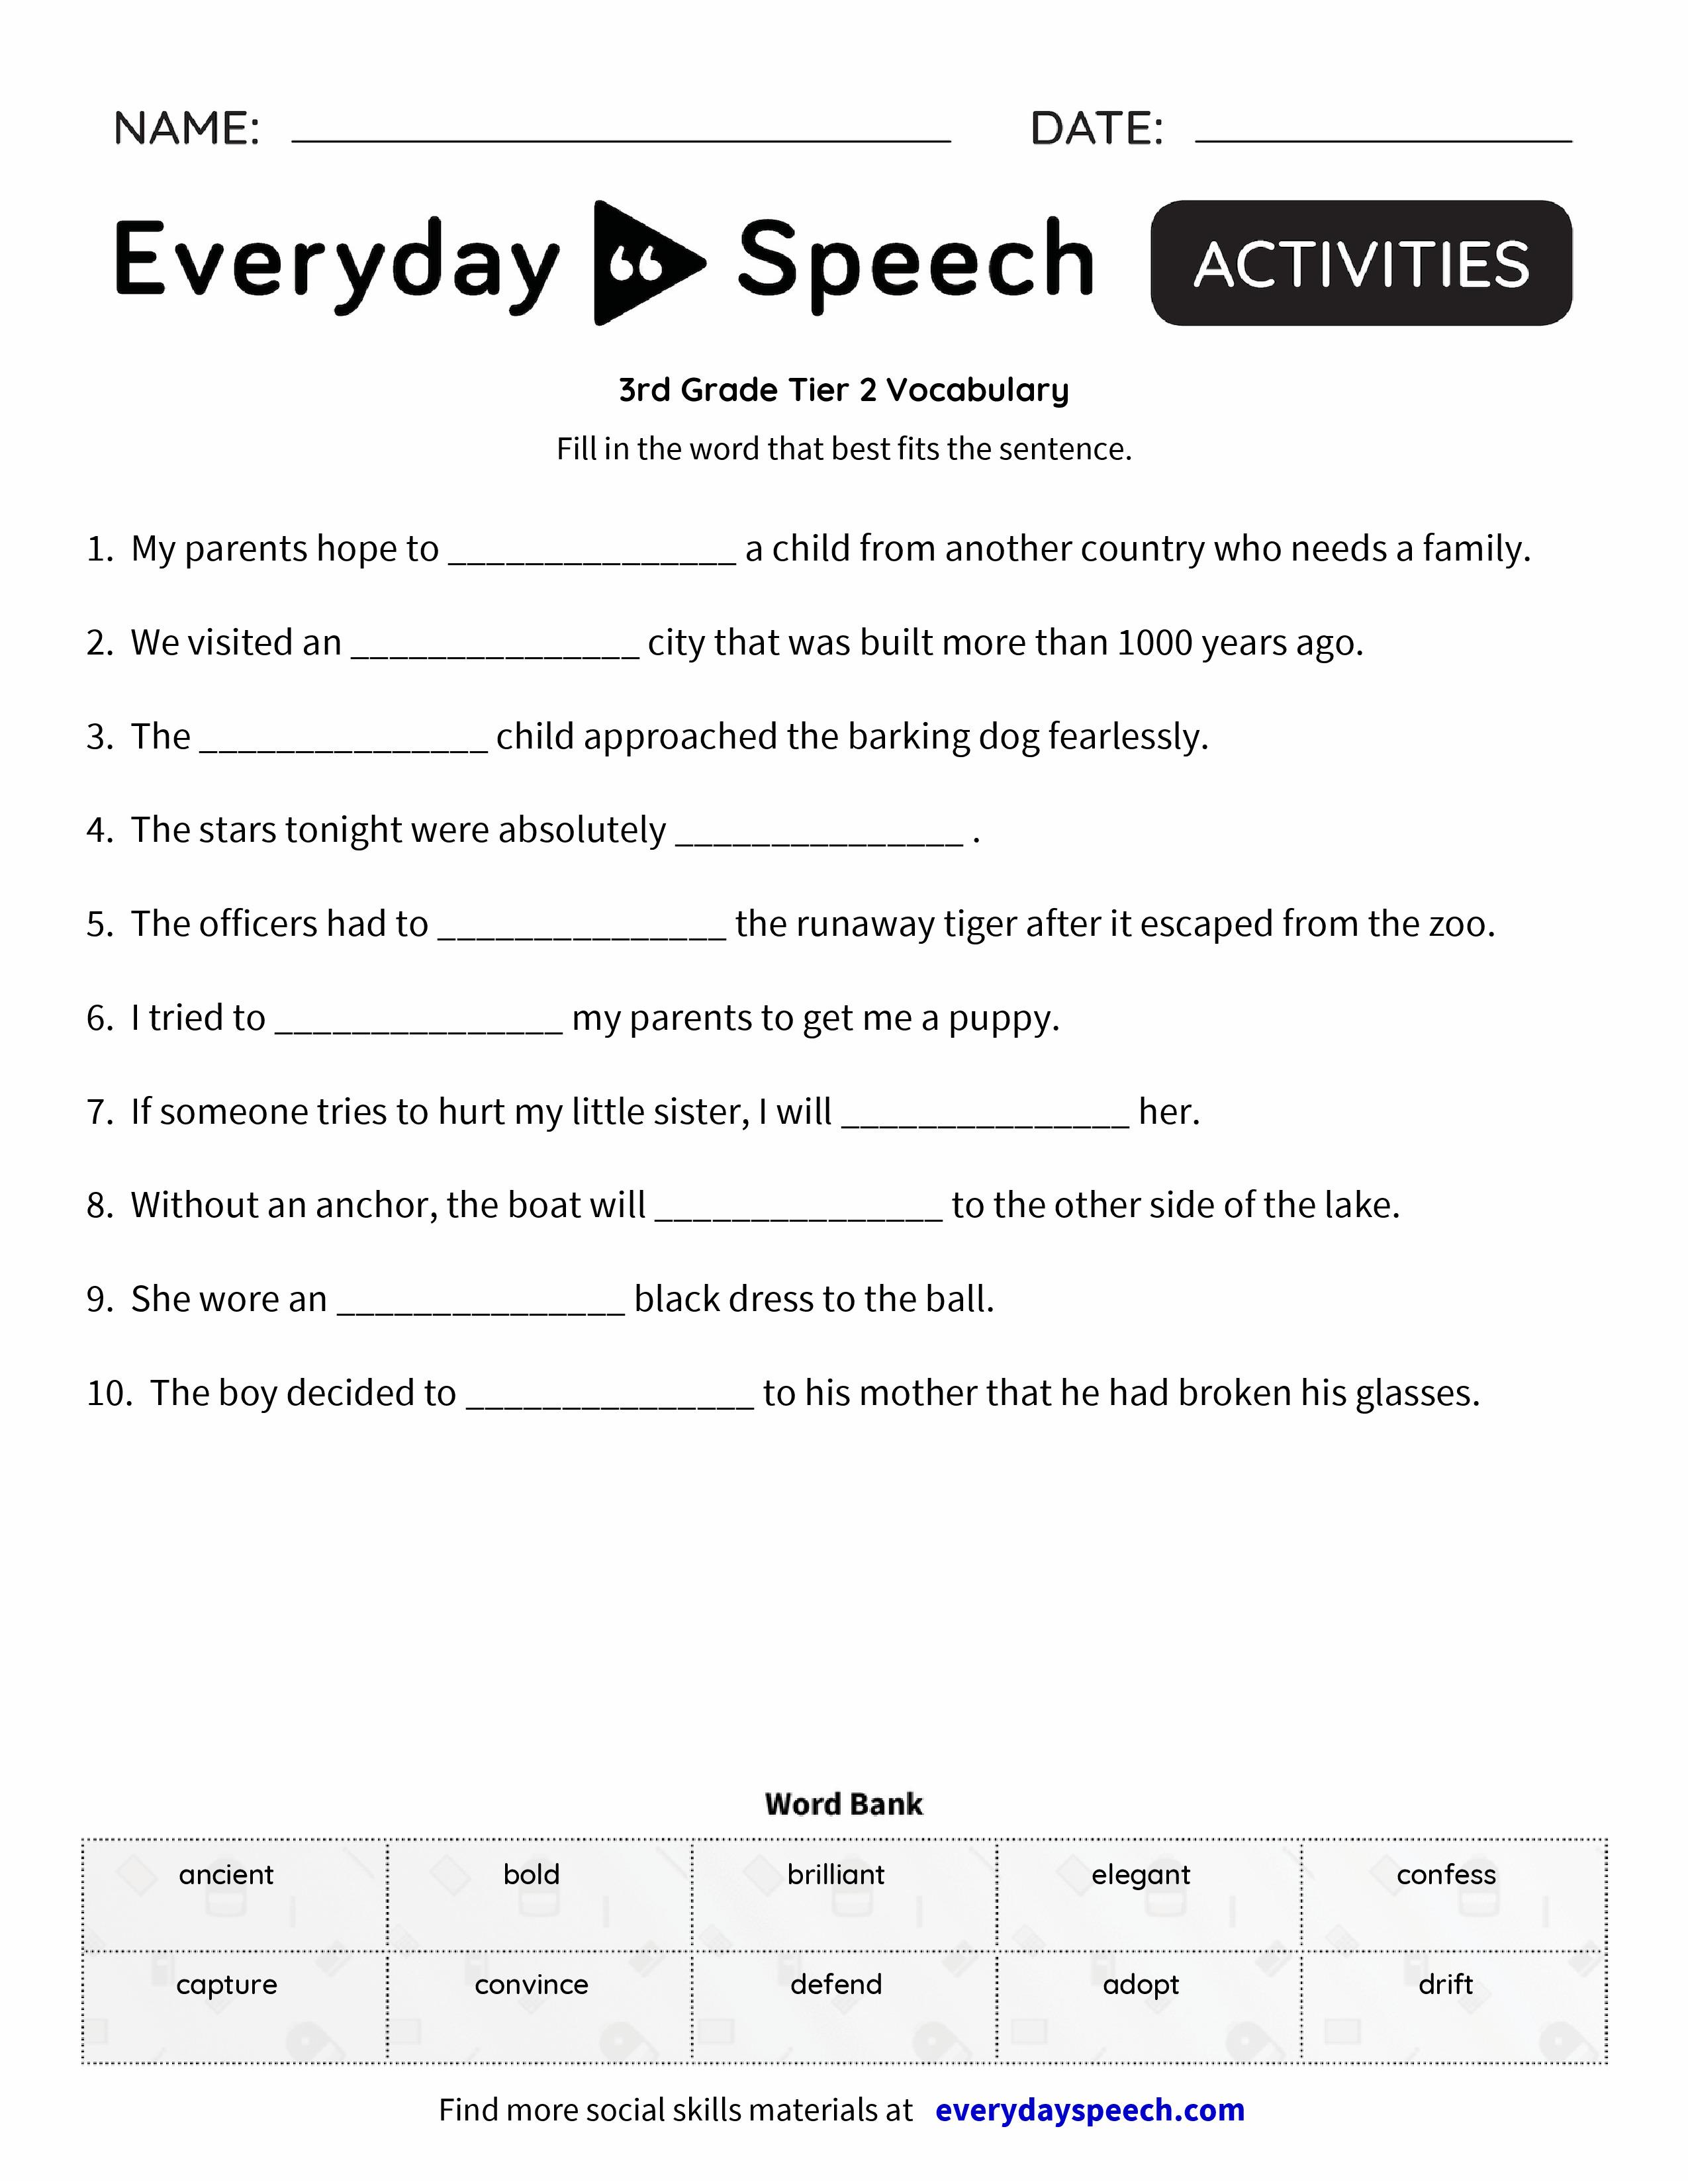 Blank Vocabulary Worksheets : Rd grade tier vocabulary everyday speech